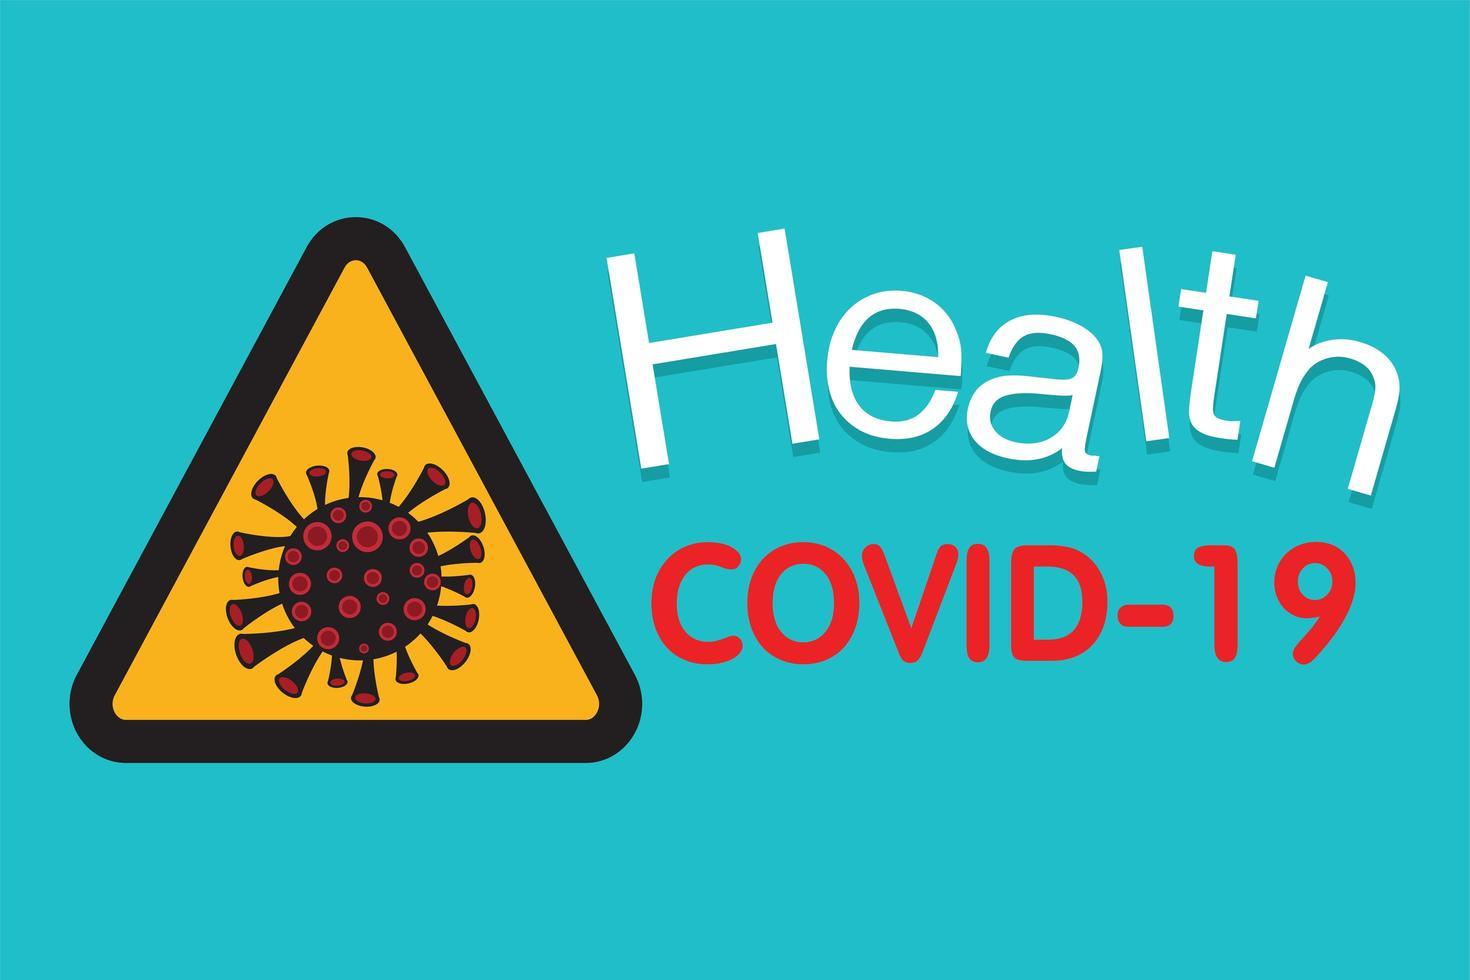 covid-19, coronavirus-uitbraak vector ontwerp